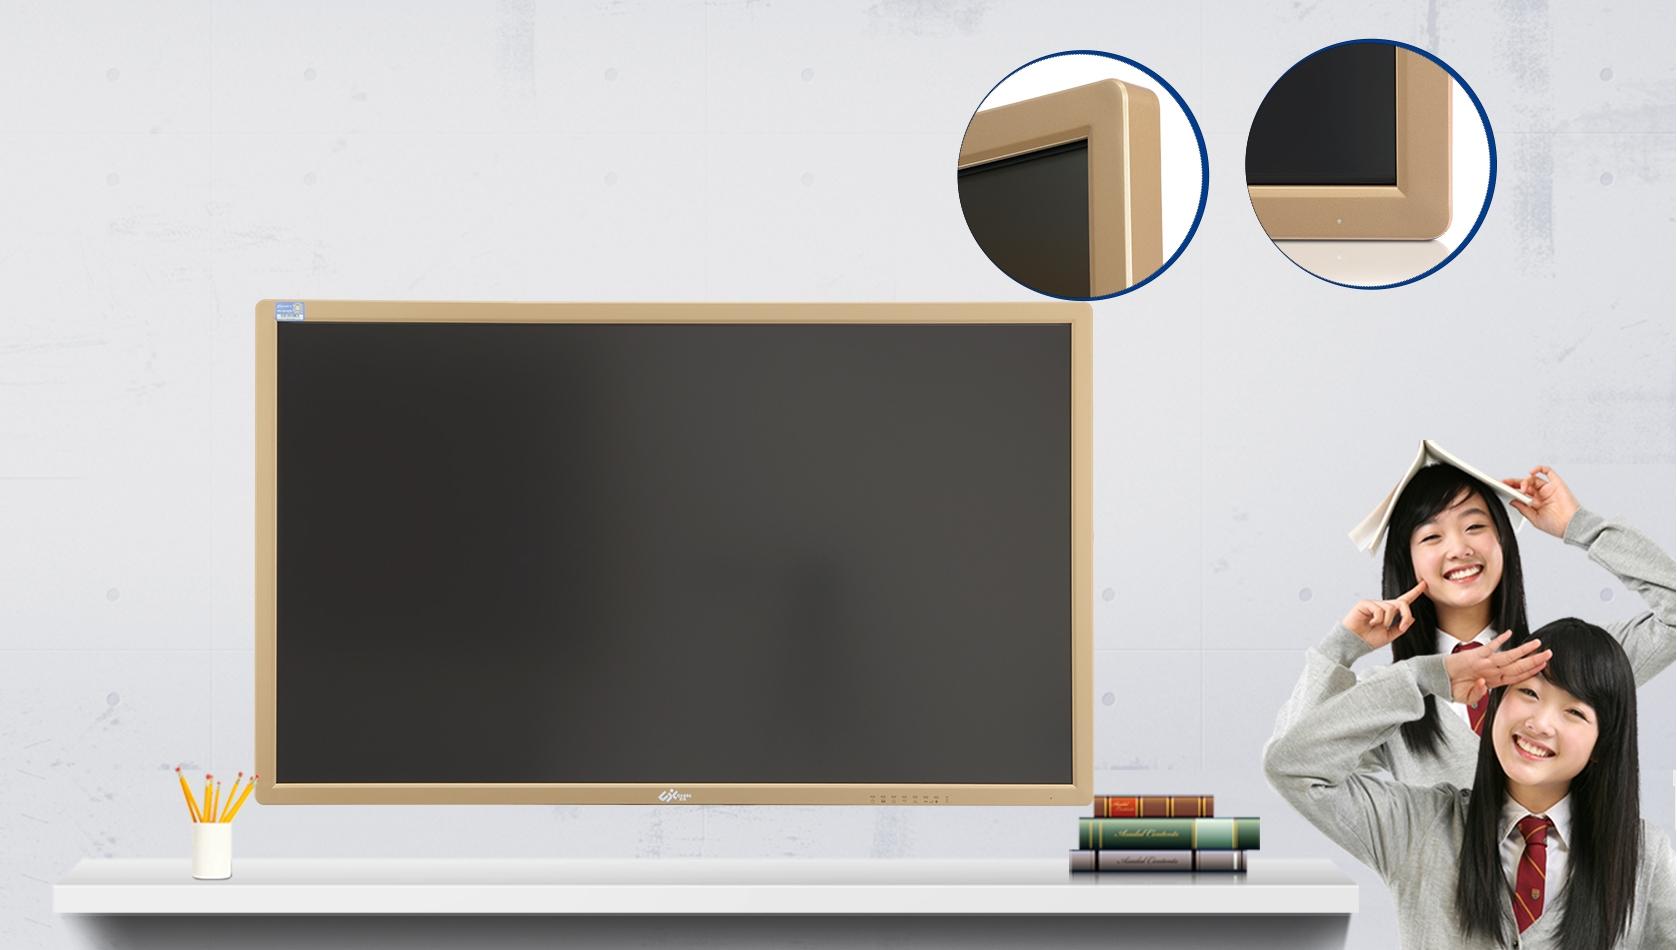 ppt 背景 背景图片 边框 模板 设计 相框 1677_950